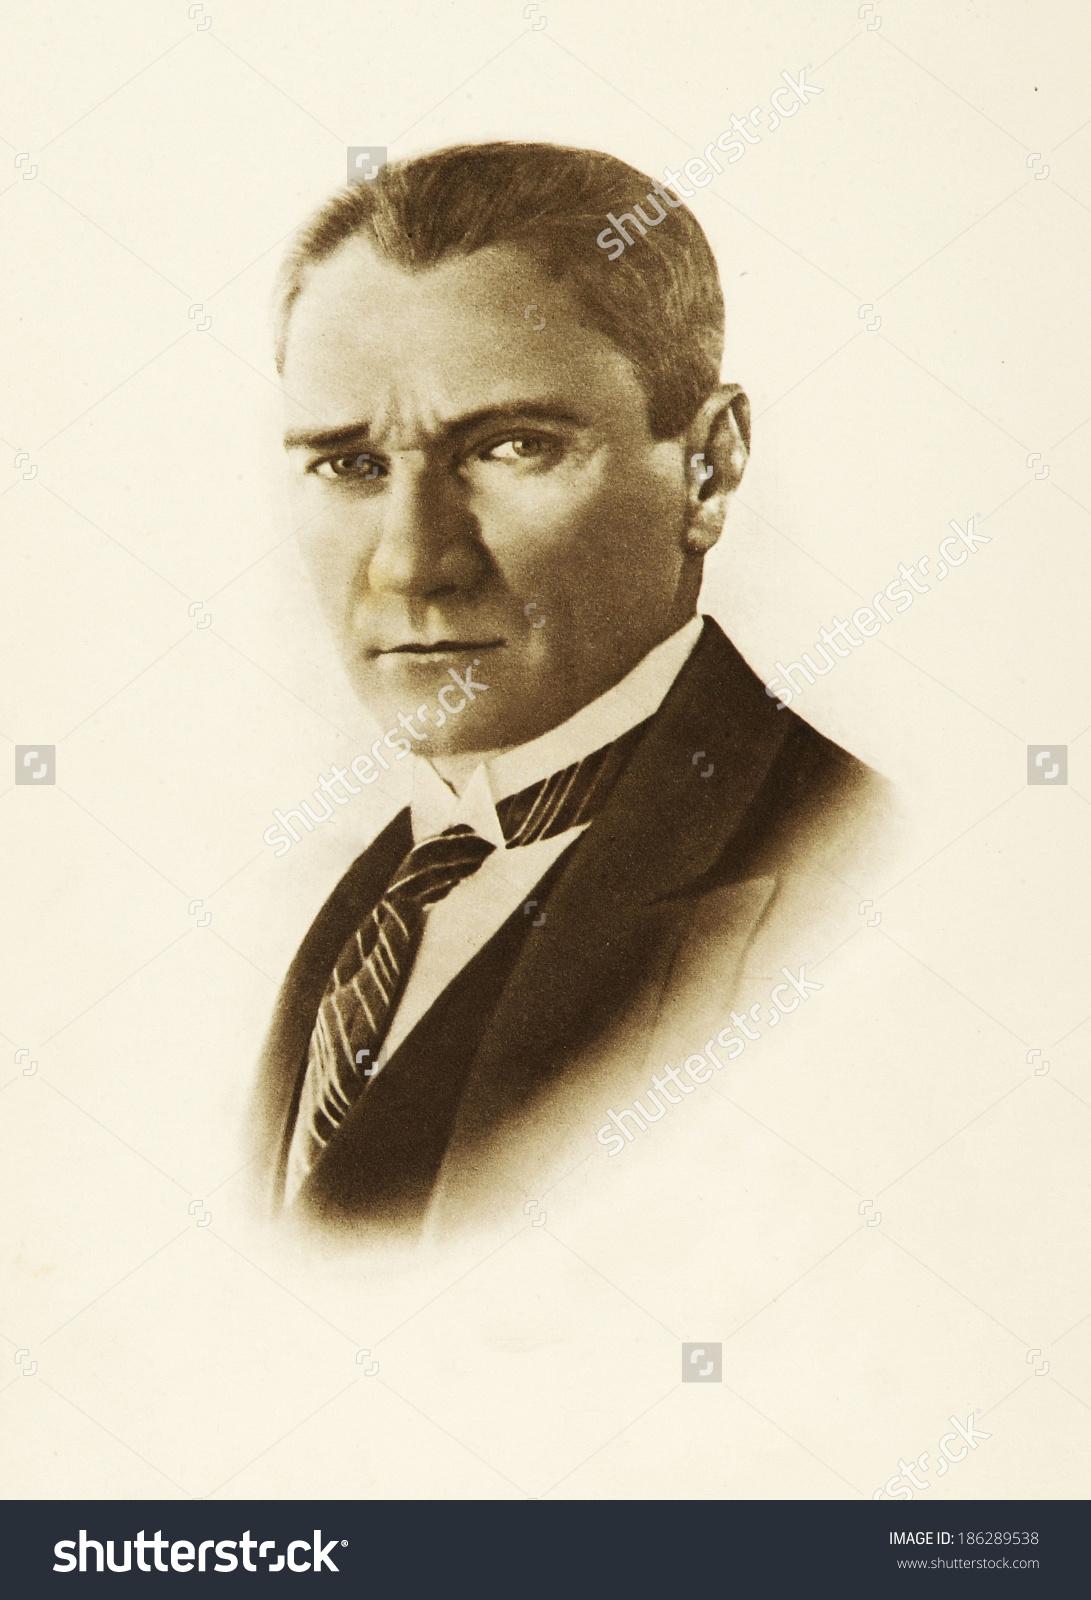 Istanbulturkeycir Ca 1920s Mustafa Kemal Ataturk Stock Photo.